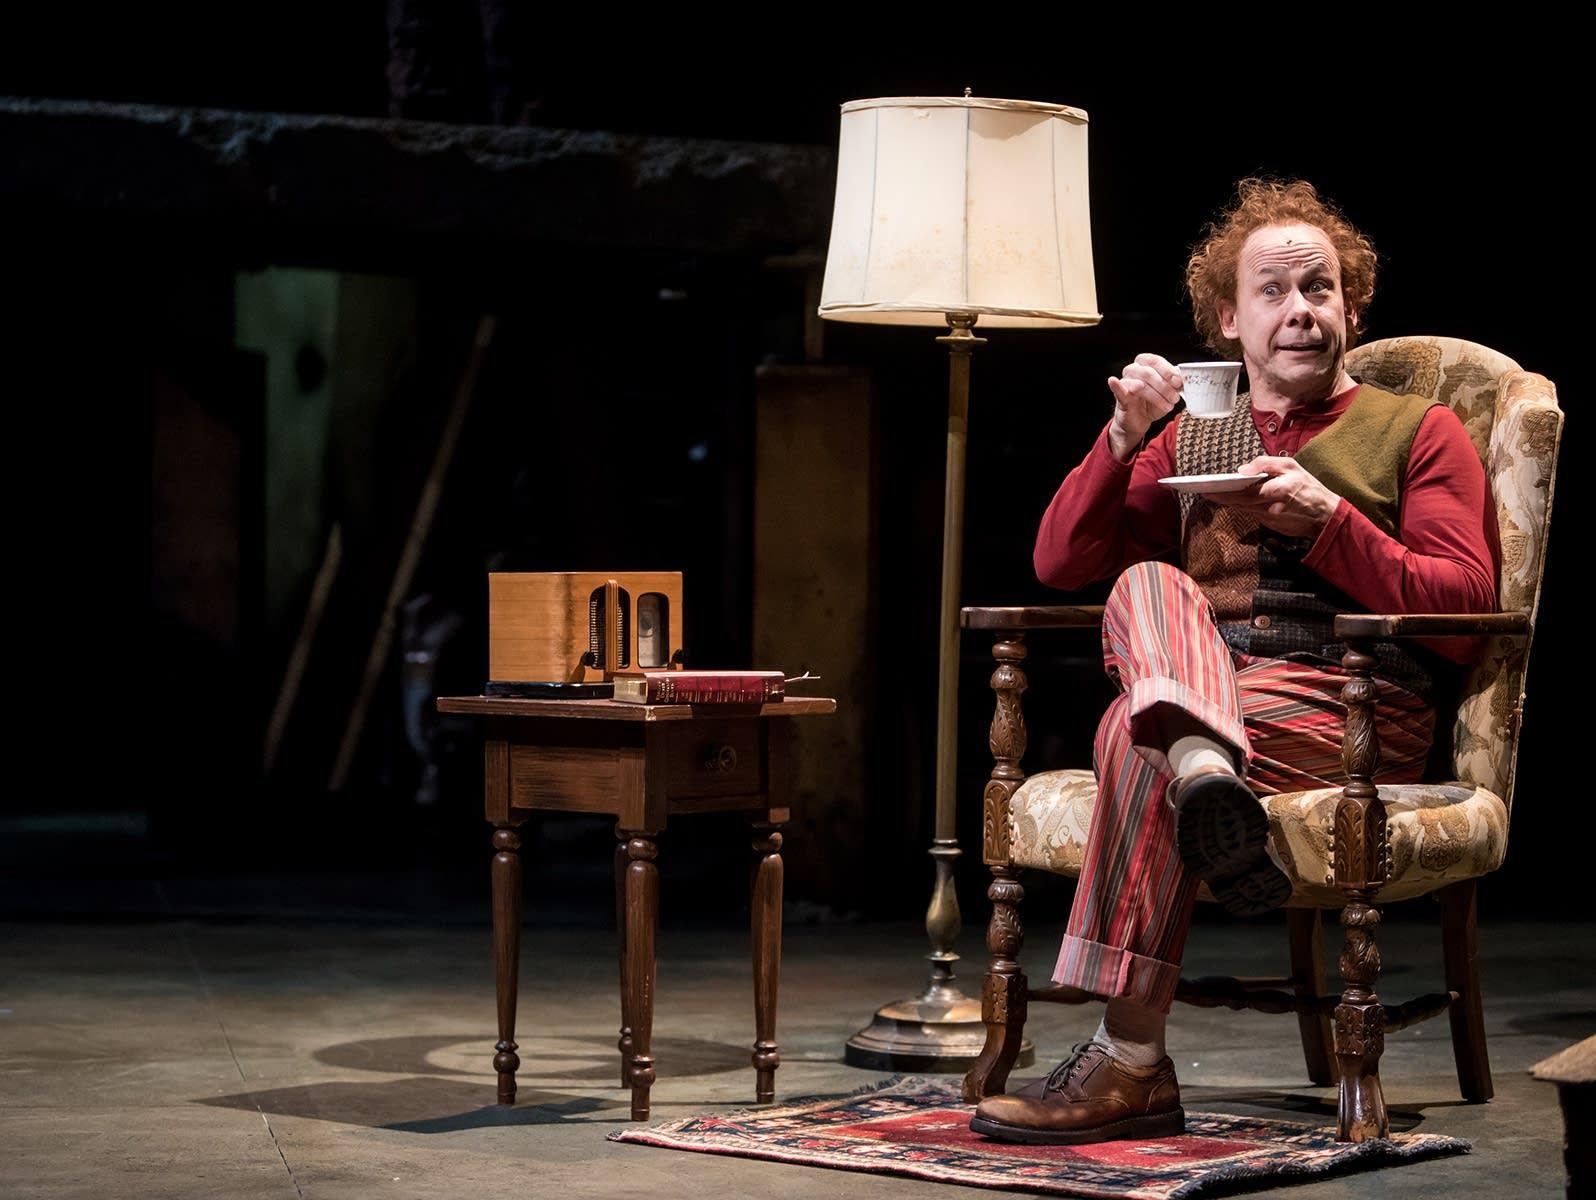 Actor Dean Holt as Bilbo Baggins in